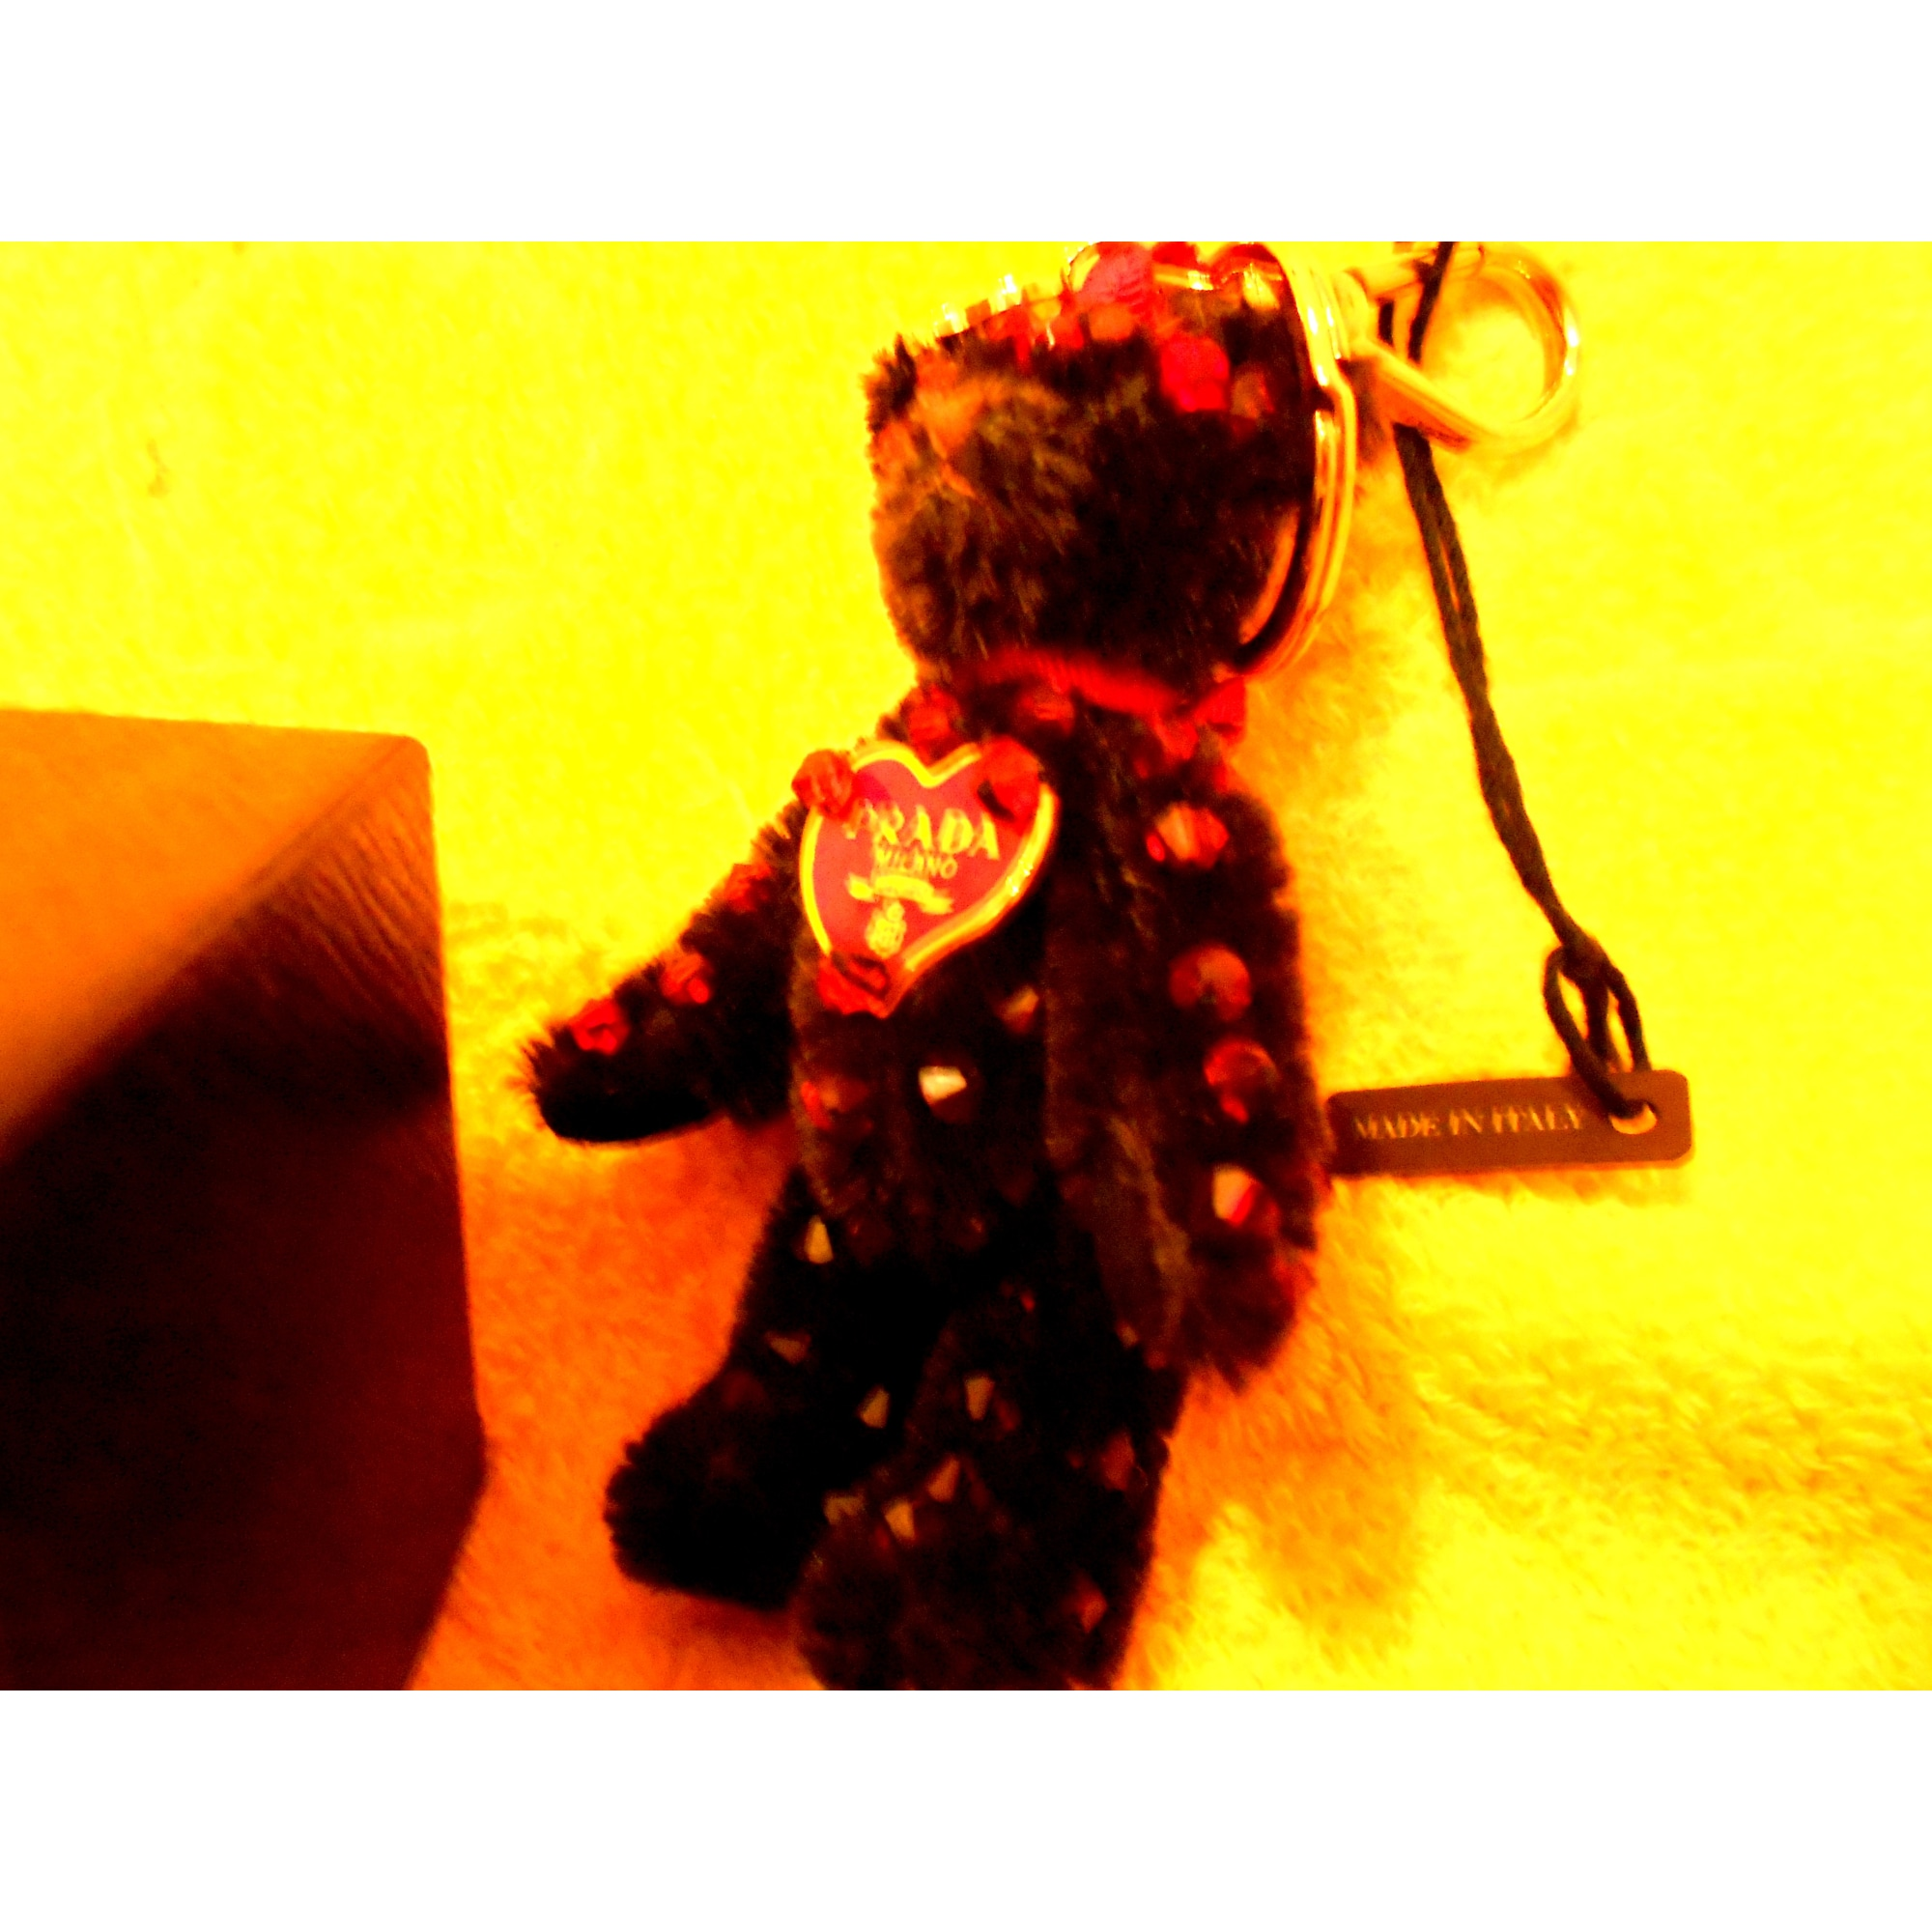 Porte-clés PRADA noir vendu par Maryse 250366 - 1825717 0821fd1a1ea